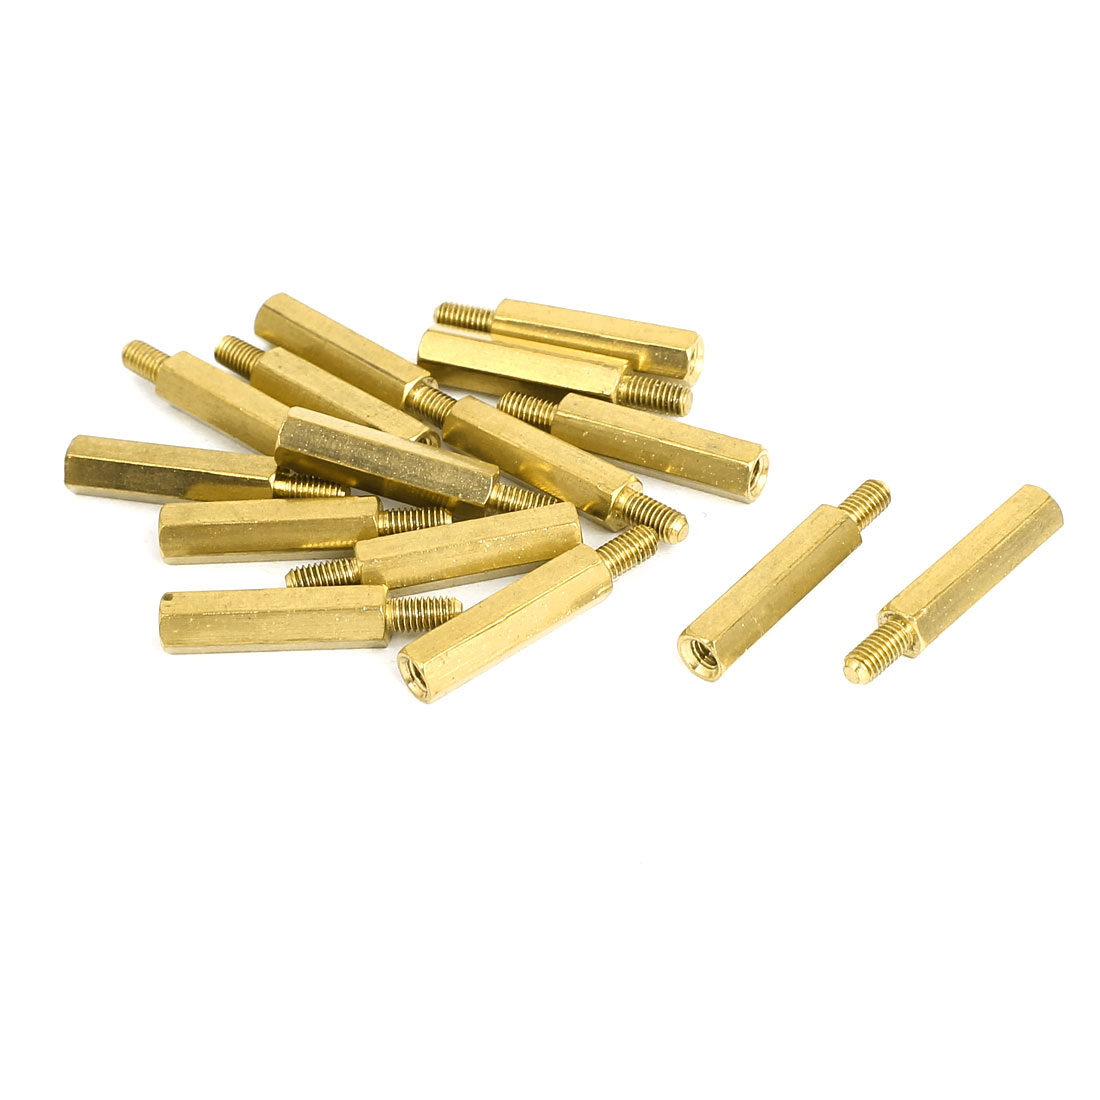 M3 Male/Female Thread Brass Hex Hexagonal Spacer Standoff Support 19mm+6mm 15pcs